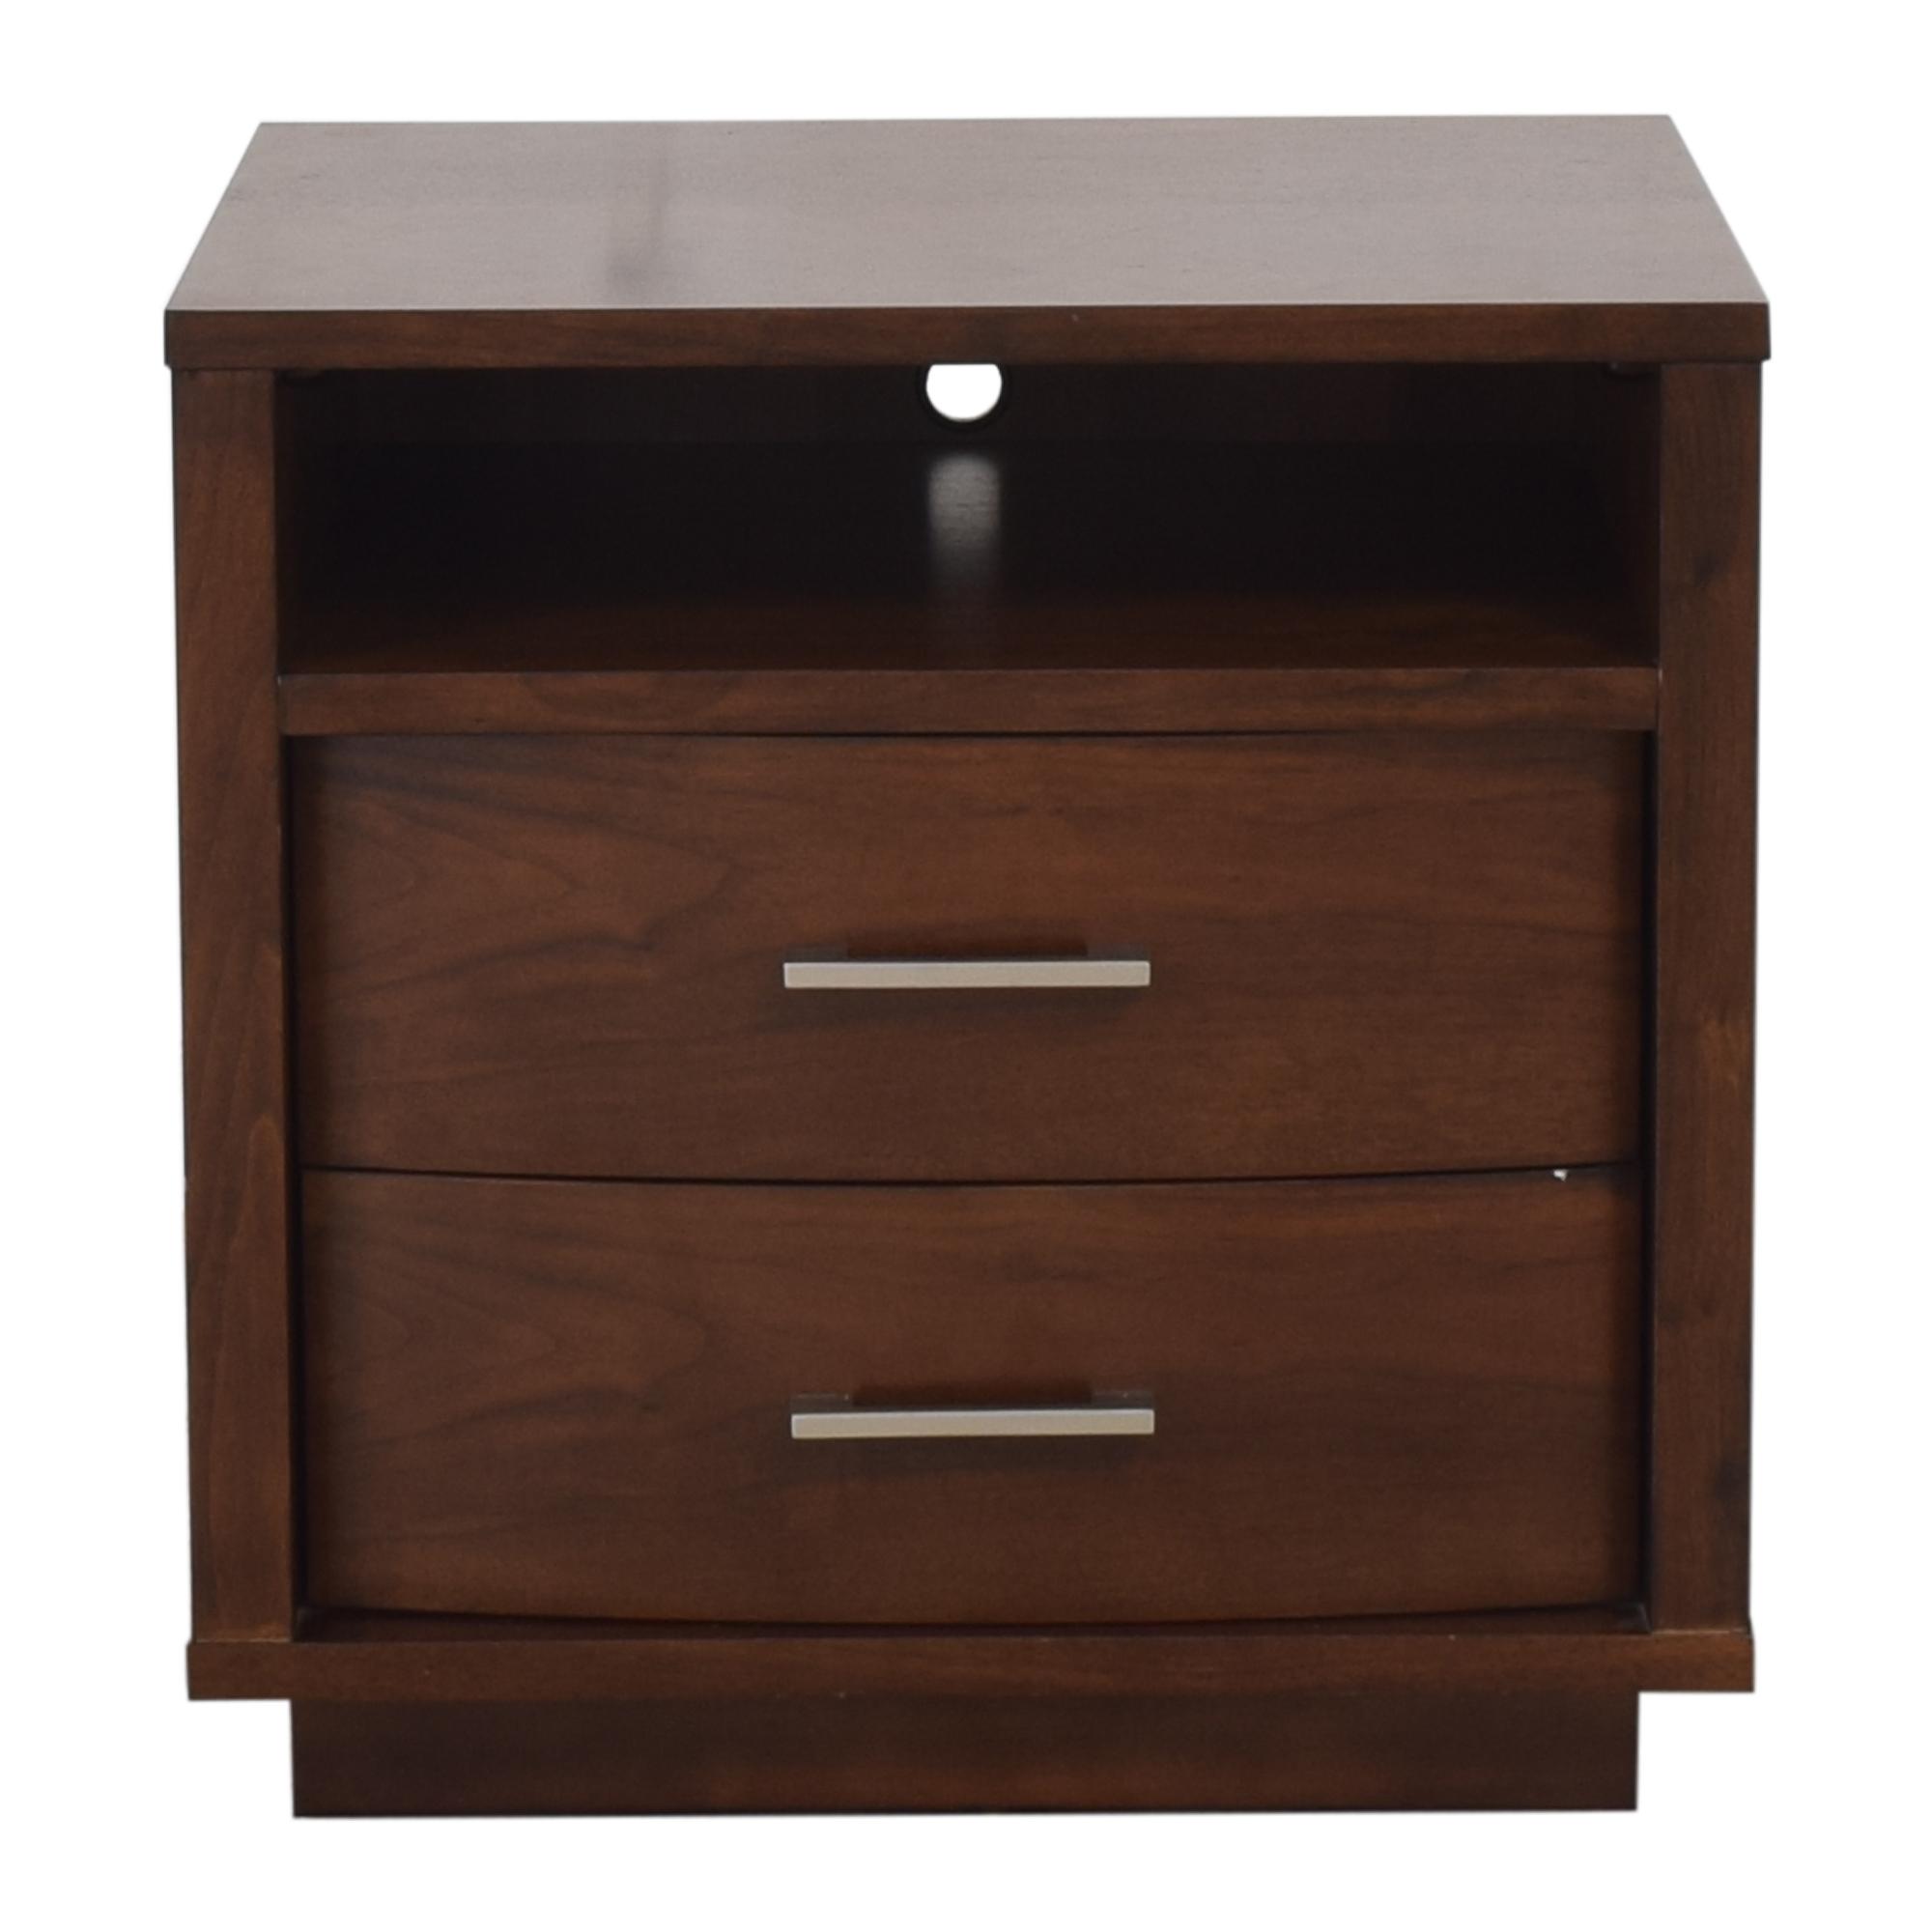 Casana Furniture Casana Two Drawer Nightstand ma